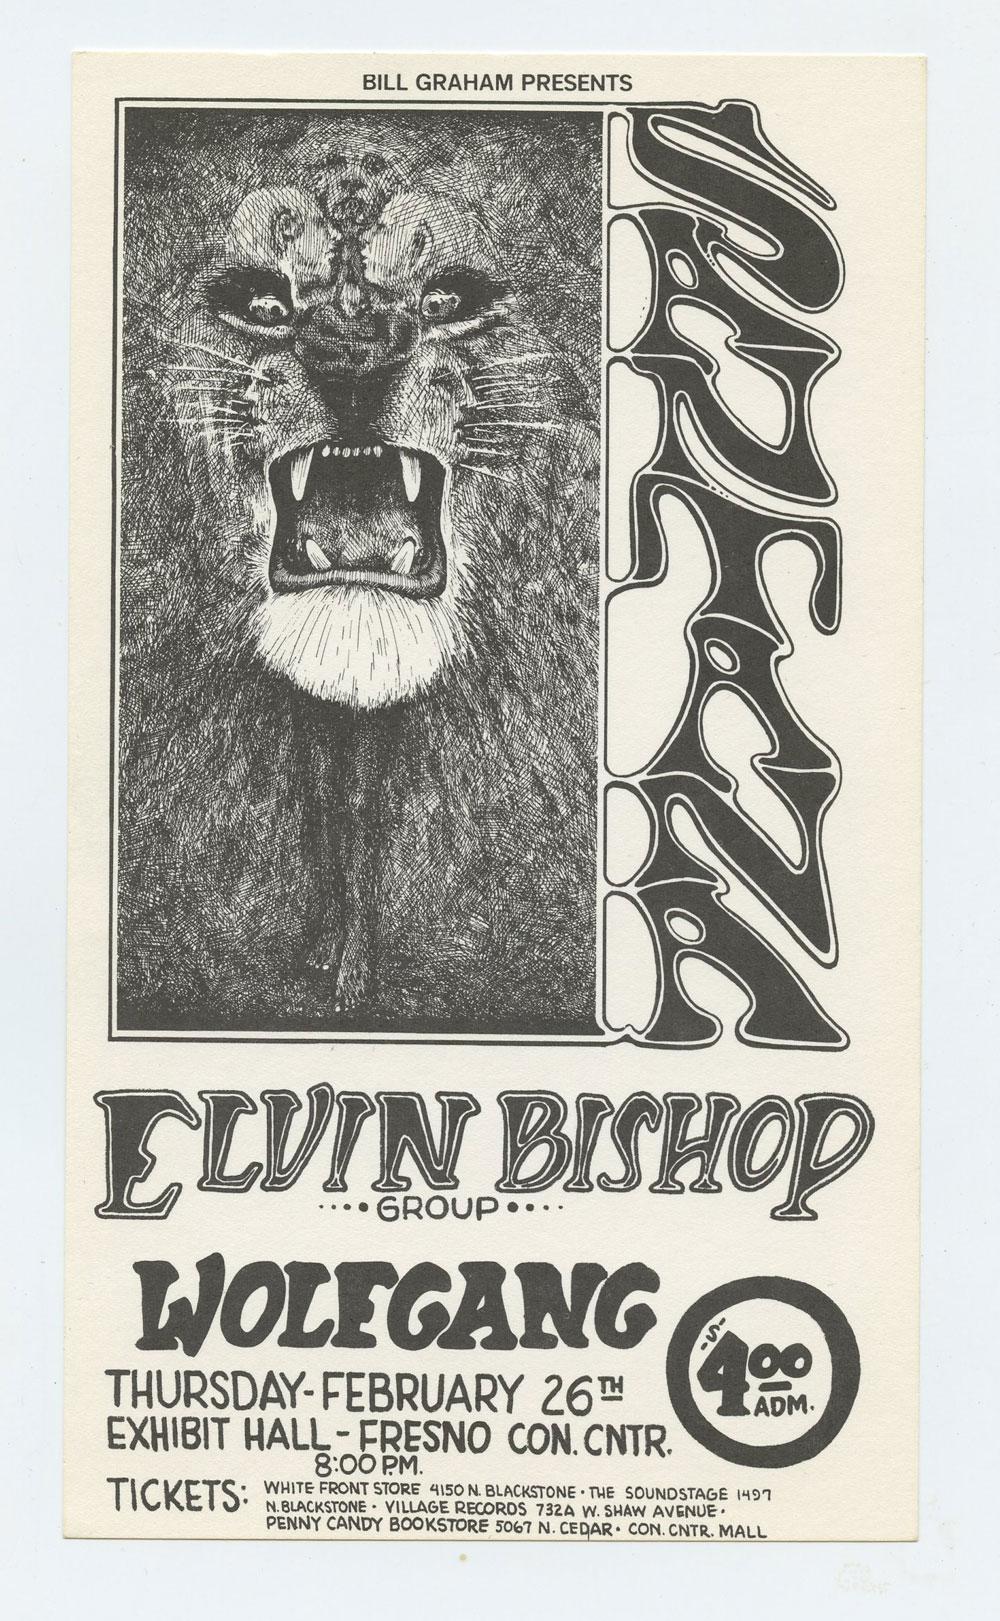 Bill Graham Presents Handbill 1970 Feb 26 Santana Elvin Bishop Fresno Exhibition Hall